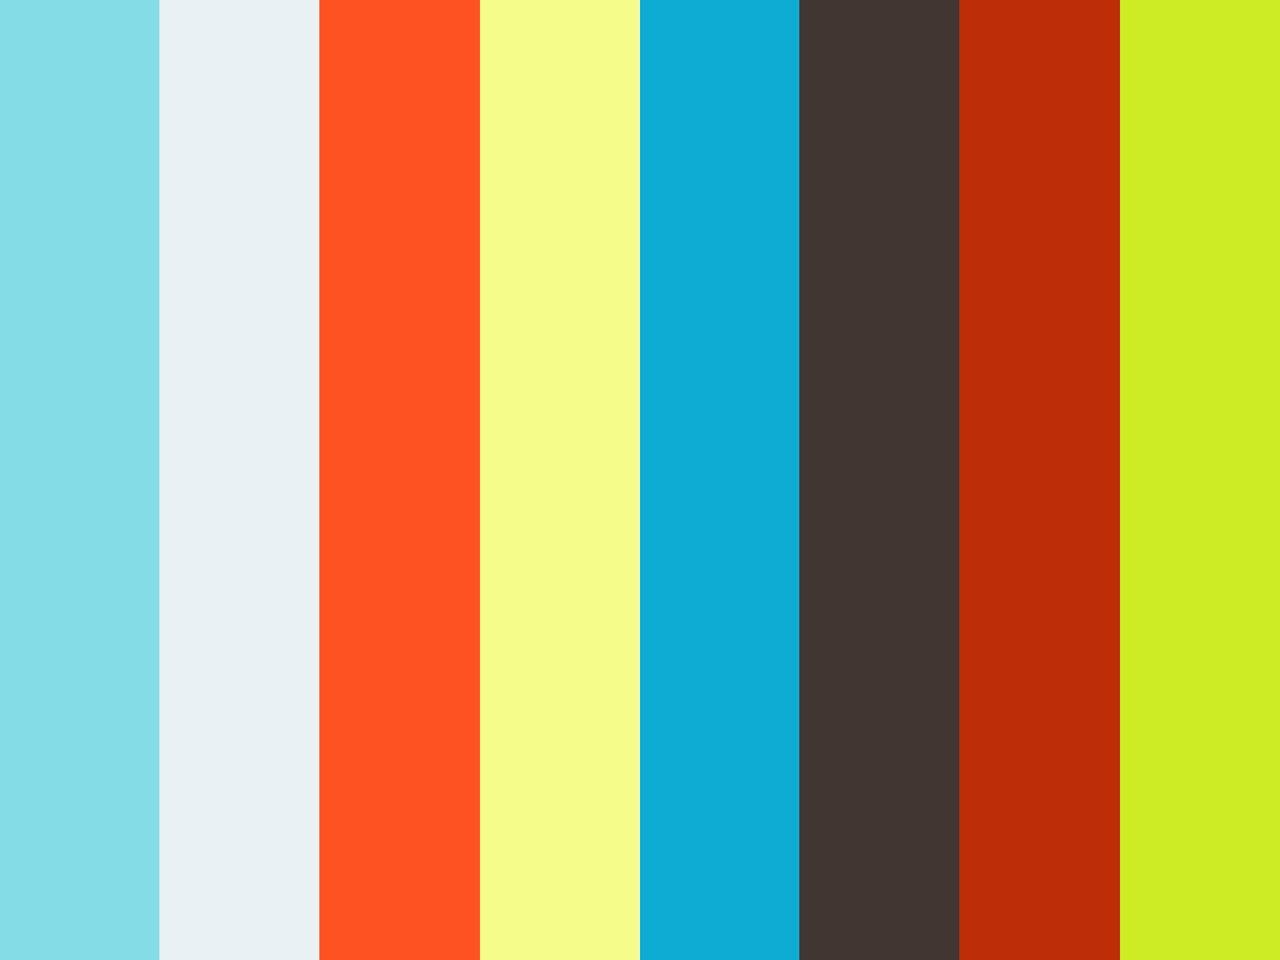 002735 - CORP - Ohlala BehaKlas - Tip 14 - Shapewear